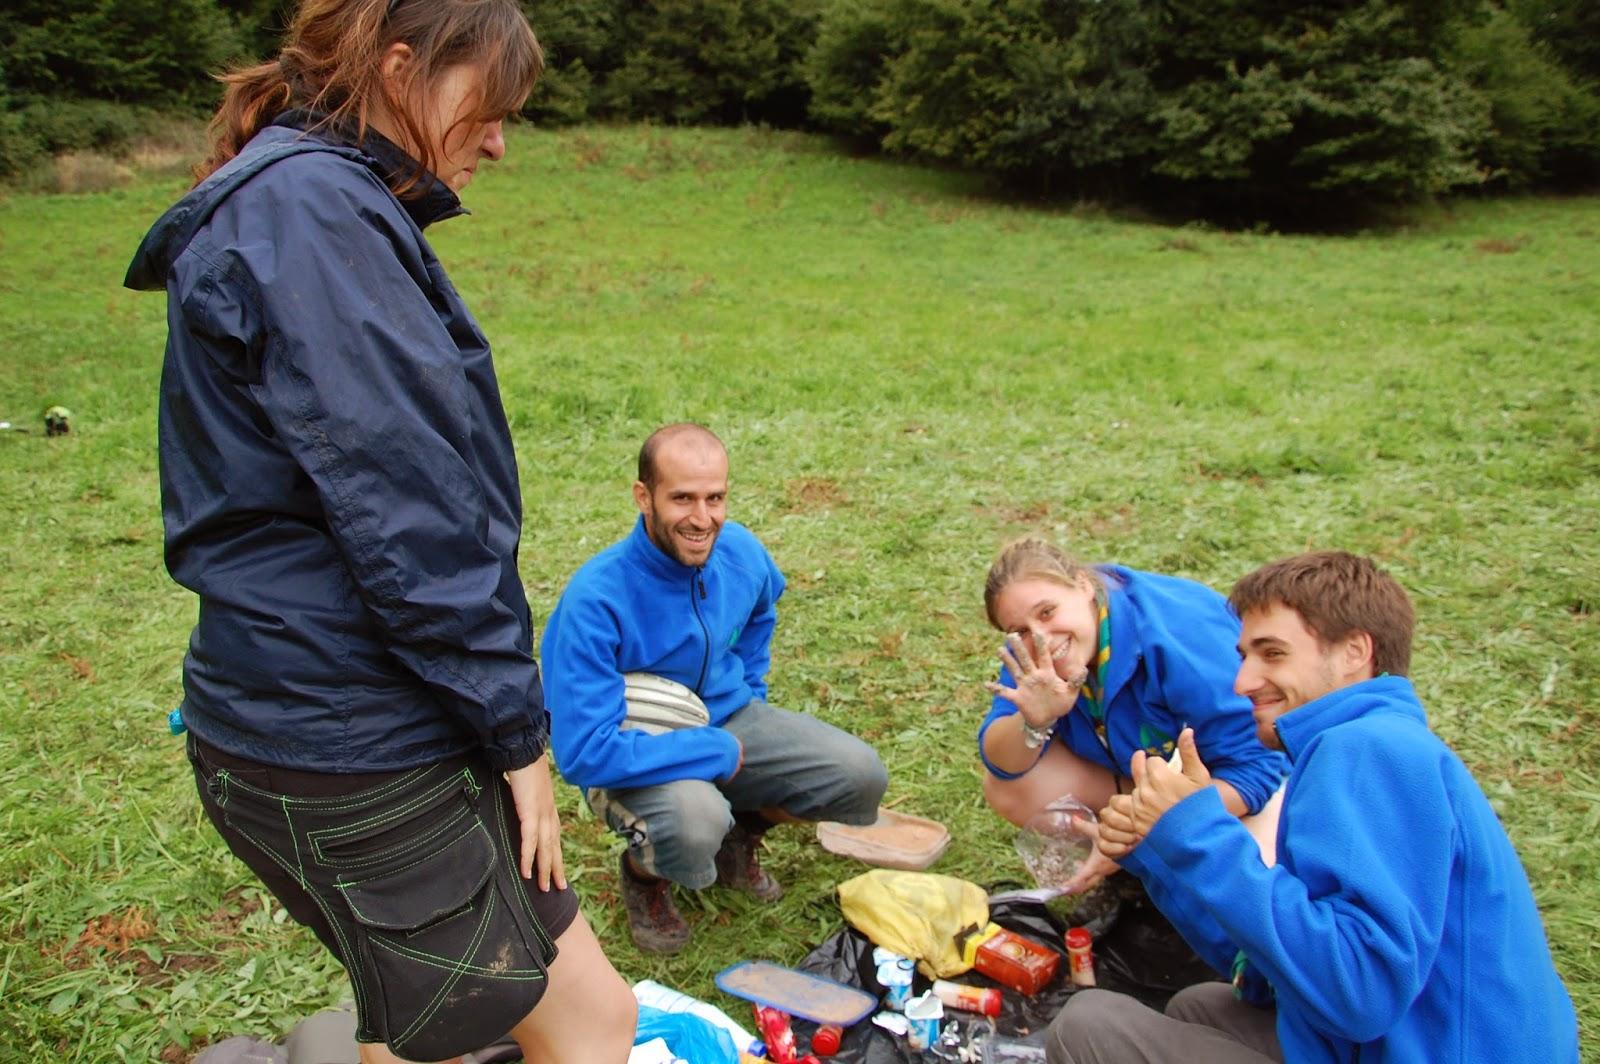 Campaments Estiu RolandKing 2011 - DSC_0301%2B2.JPG